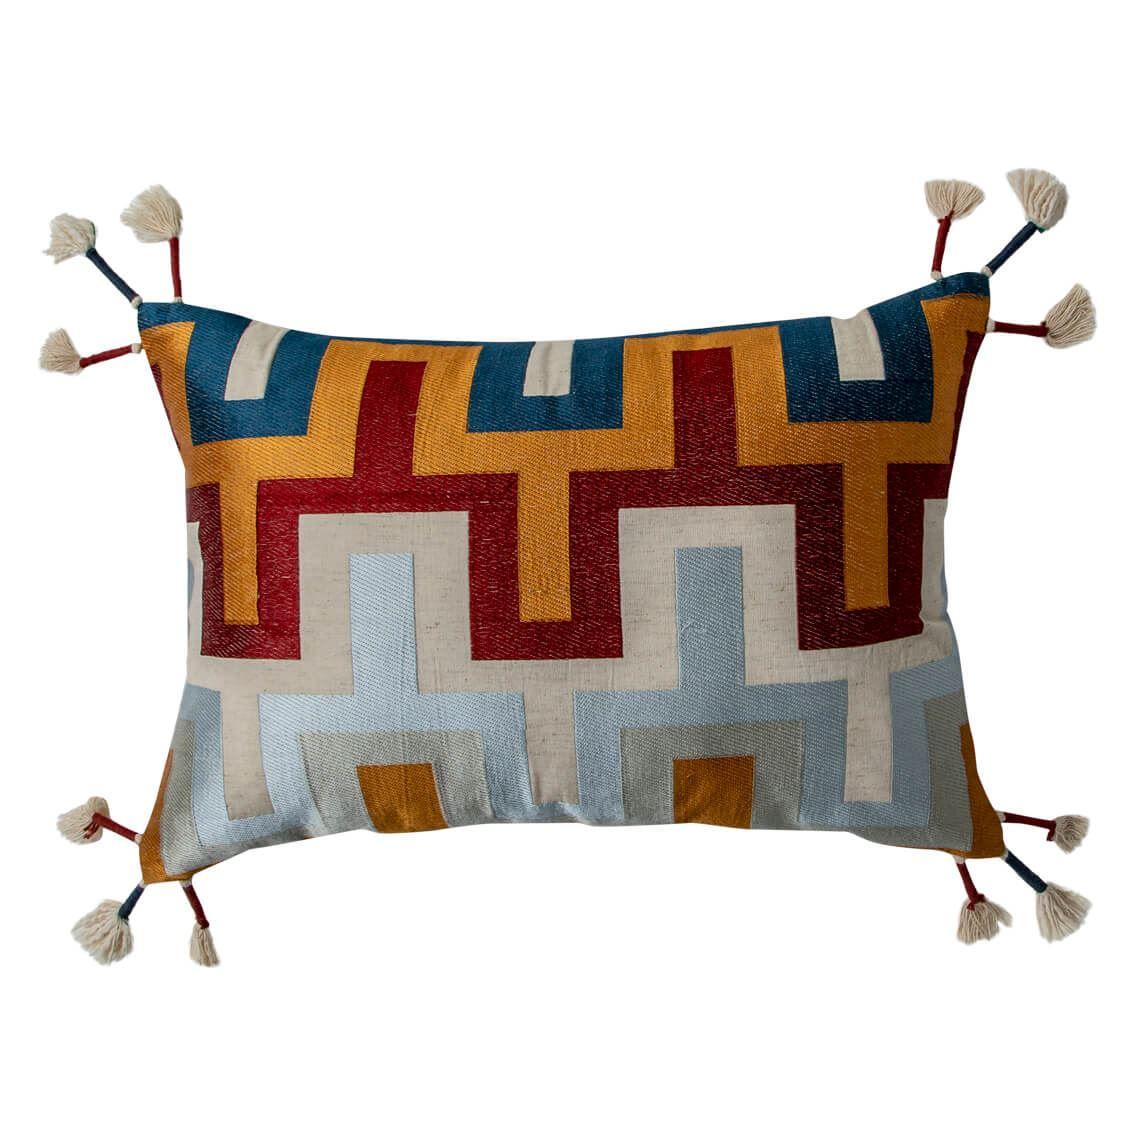 Minnie Cushion Size W 50cm x D 30cm x H 10cm Freedom